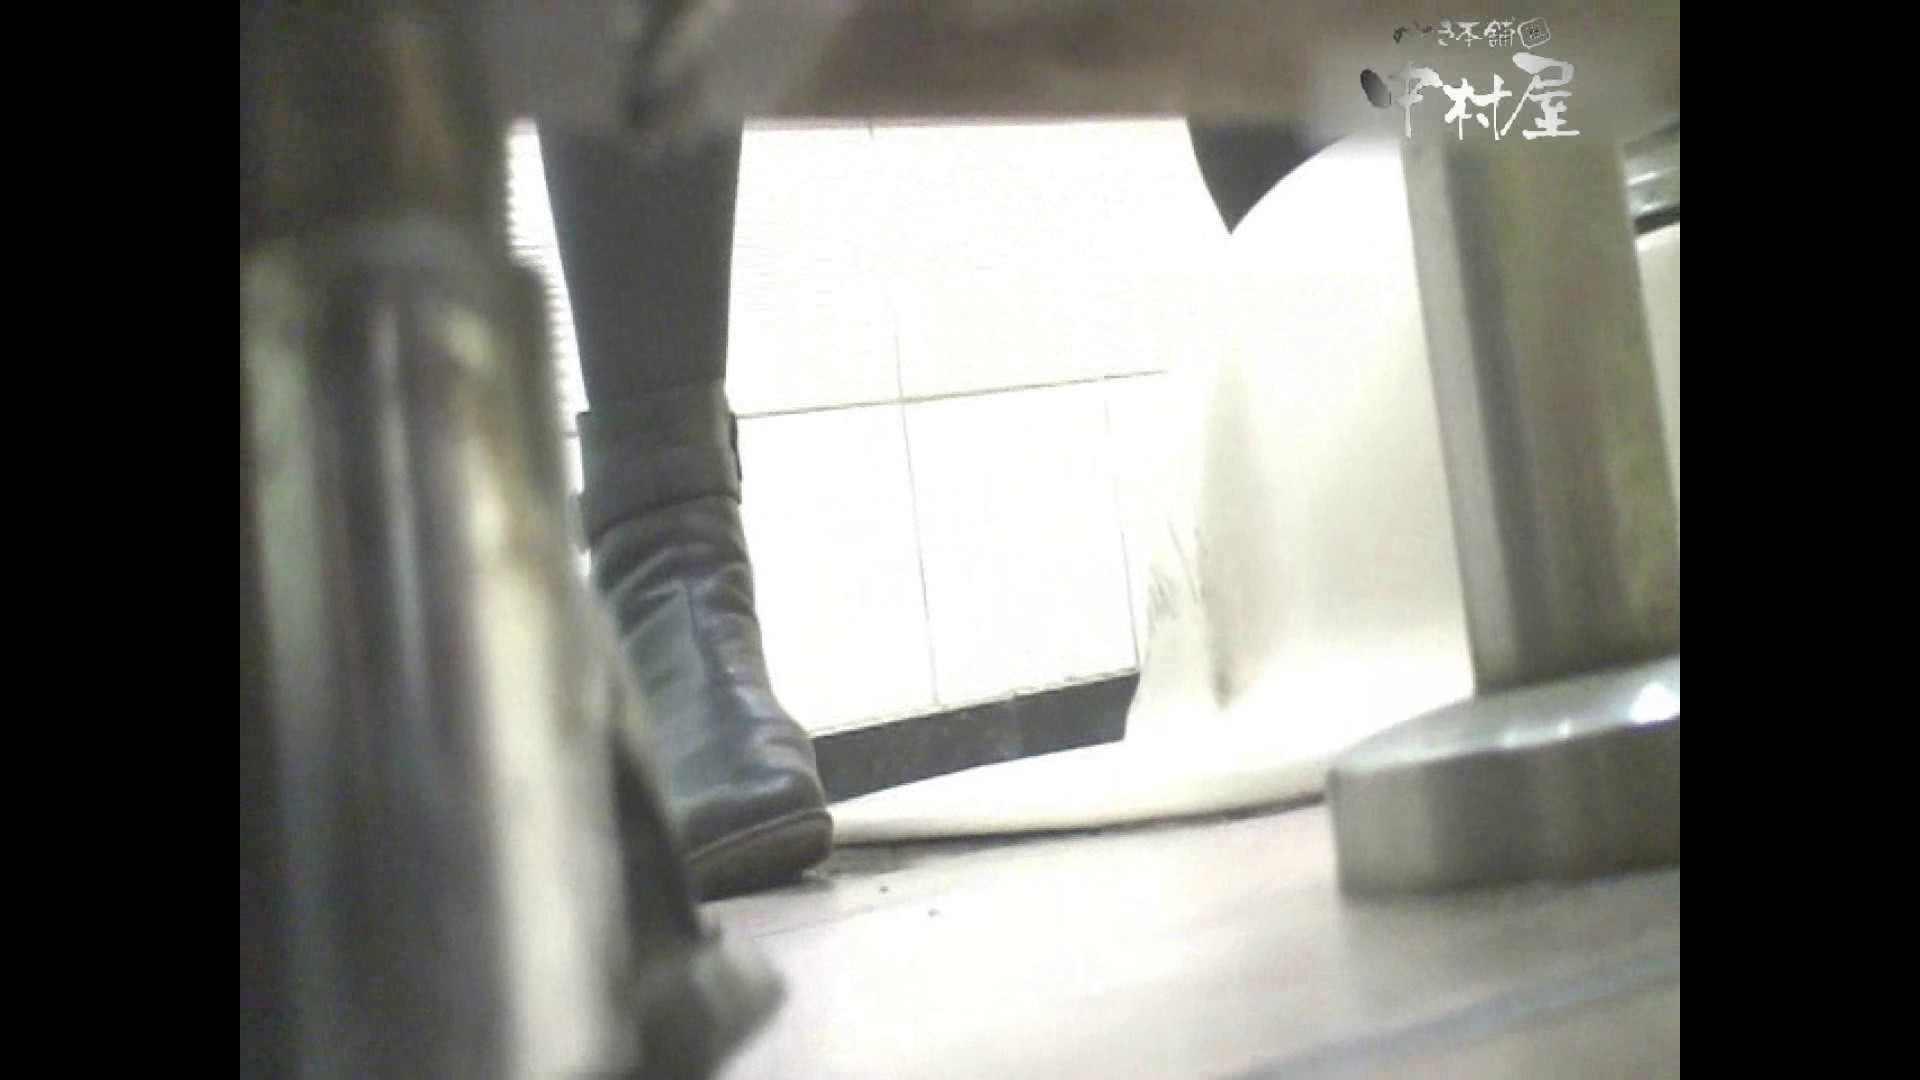 岩手県在住盗撮師盗撮記録vol.25 盗撮 おめこ無修正動画無料 53画像 39